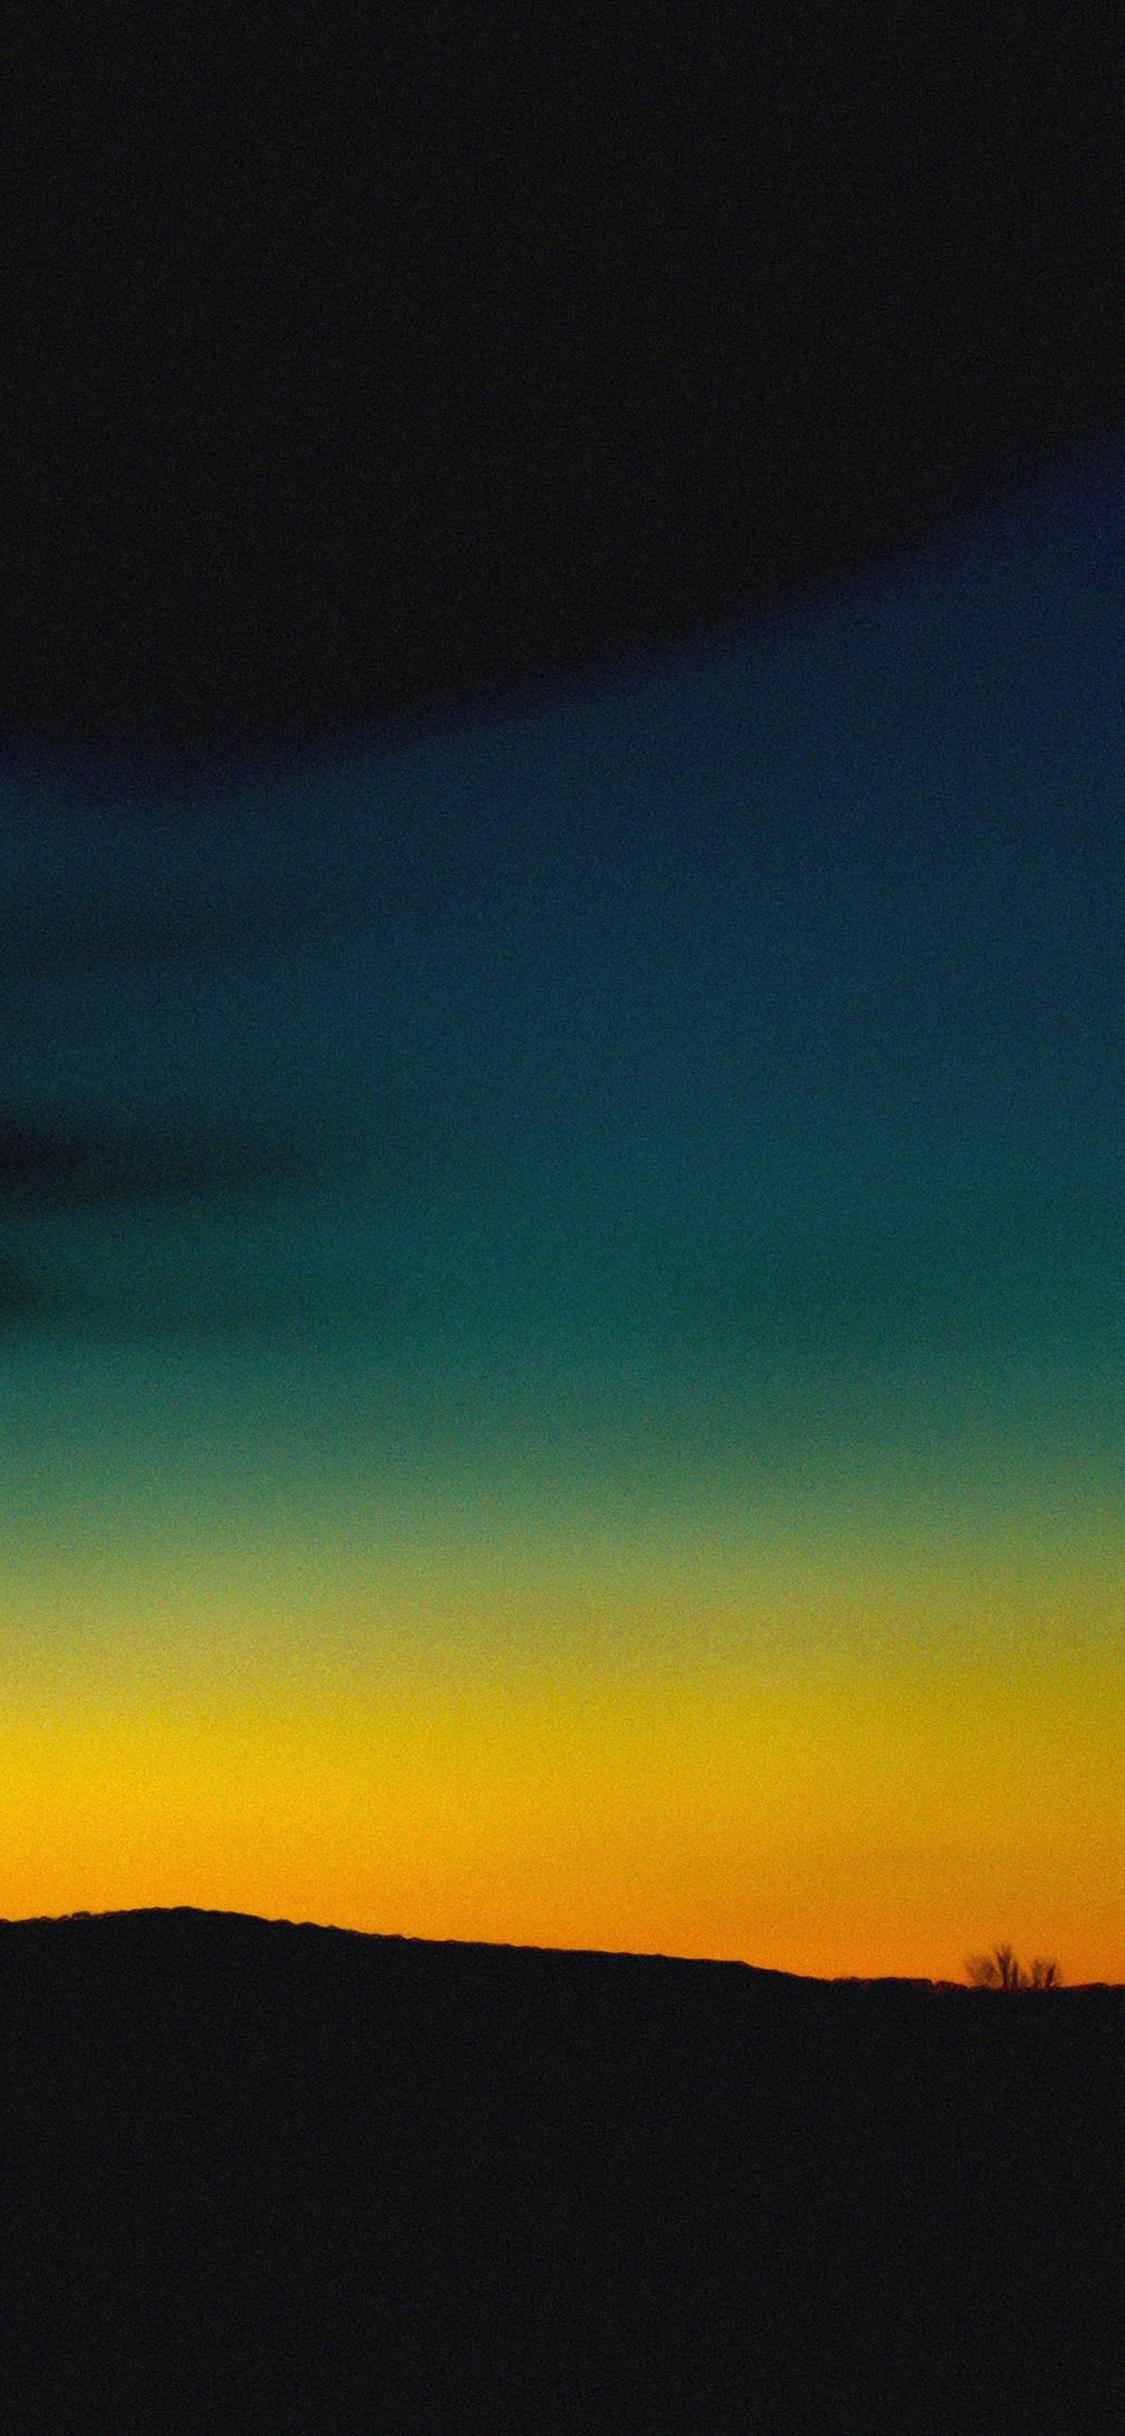 Orange Green Sky Sunset Nature iPhone X wallpaper